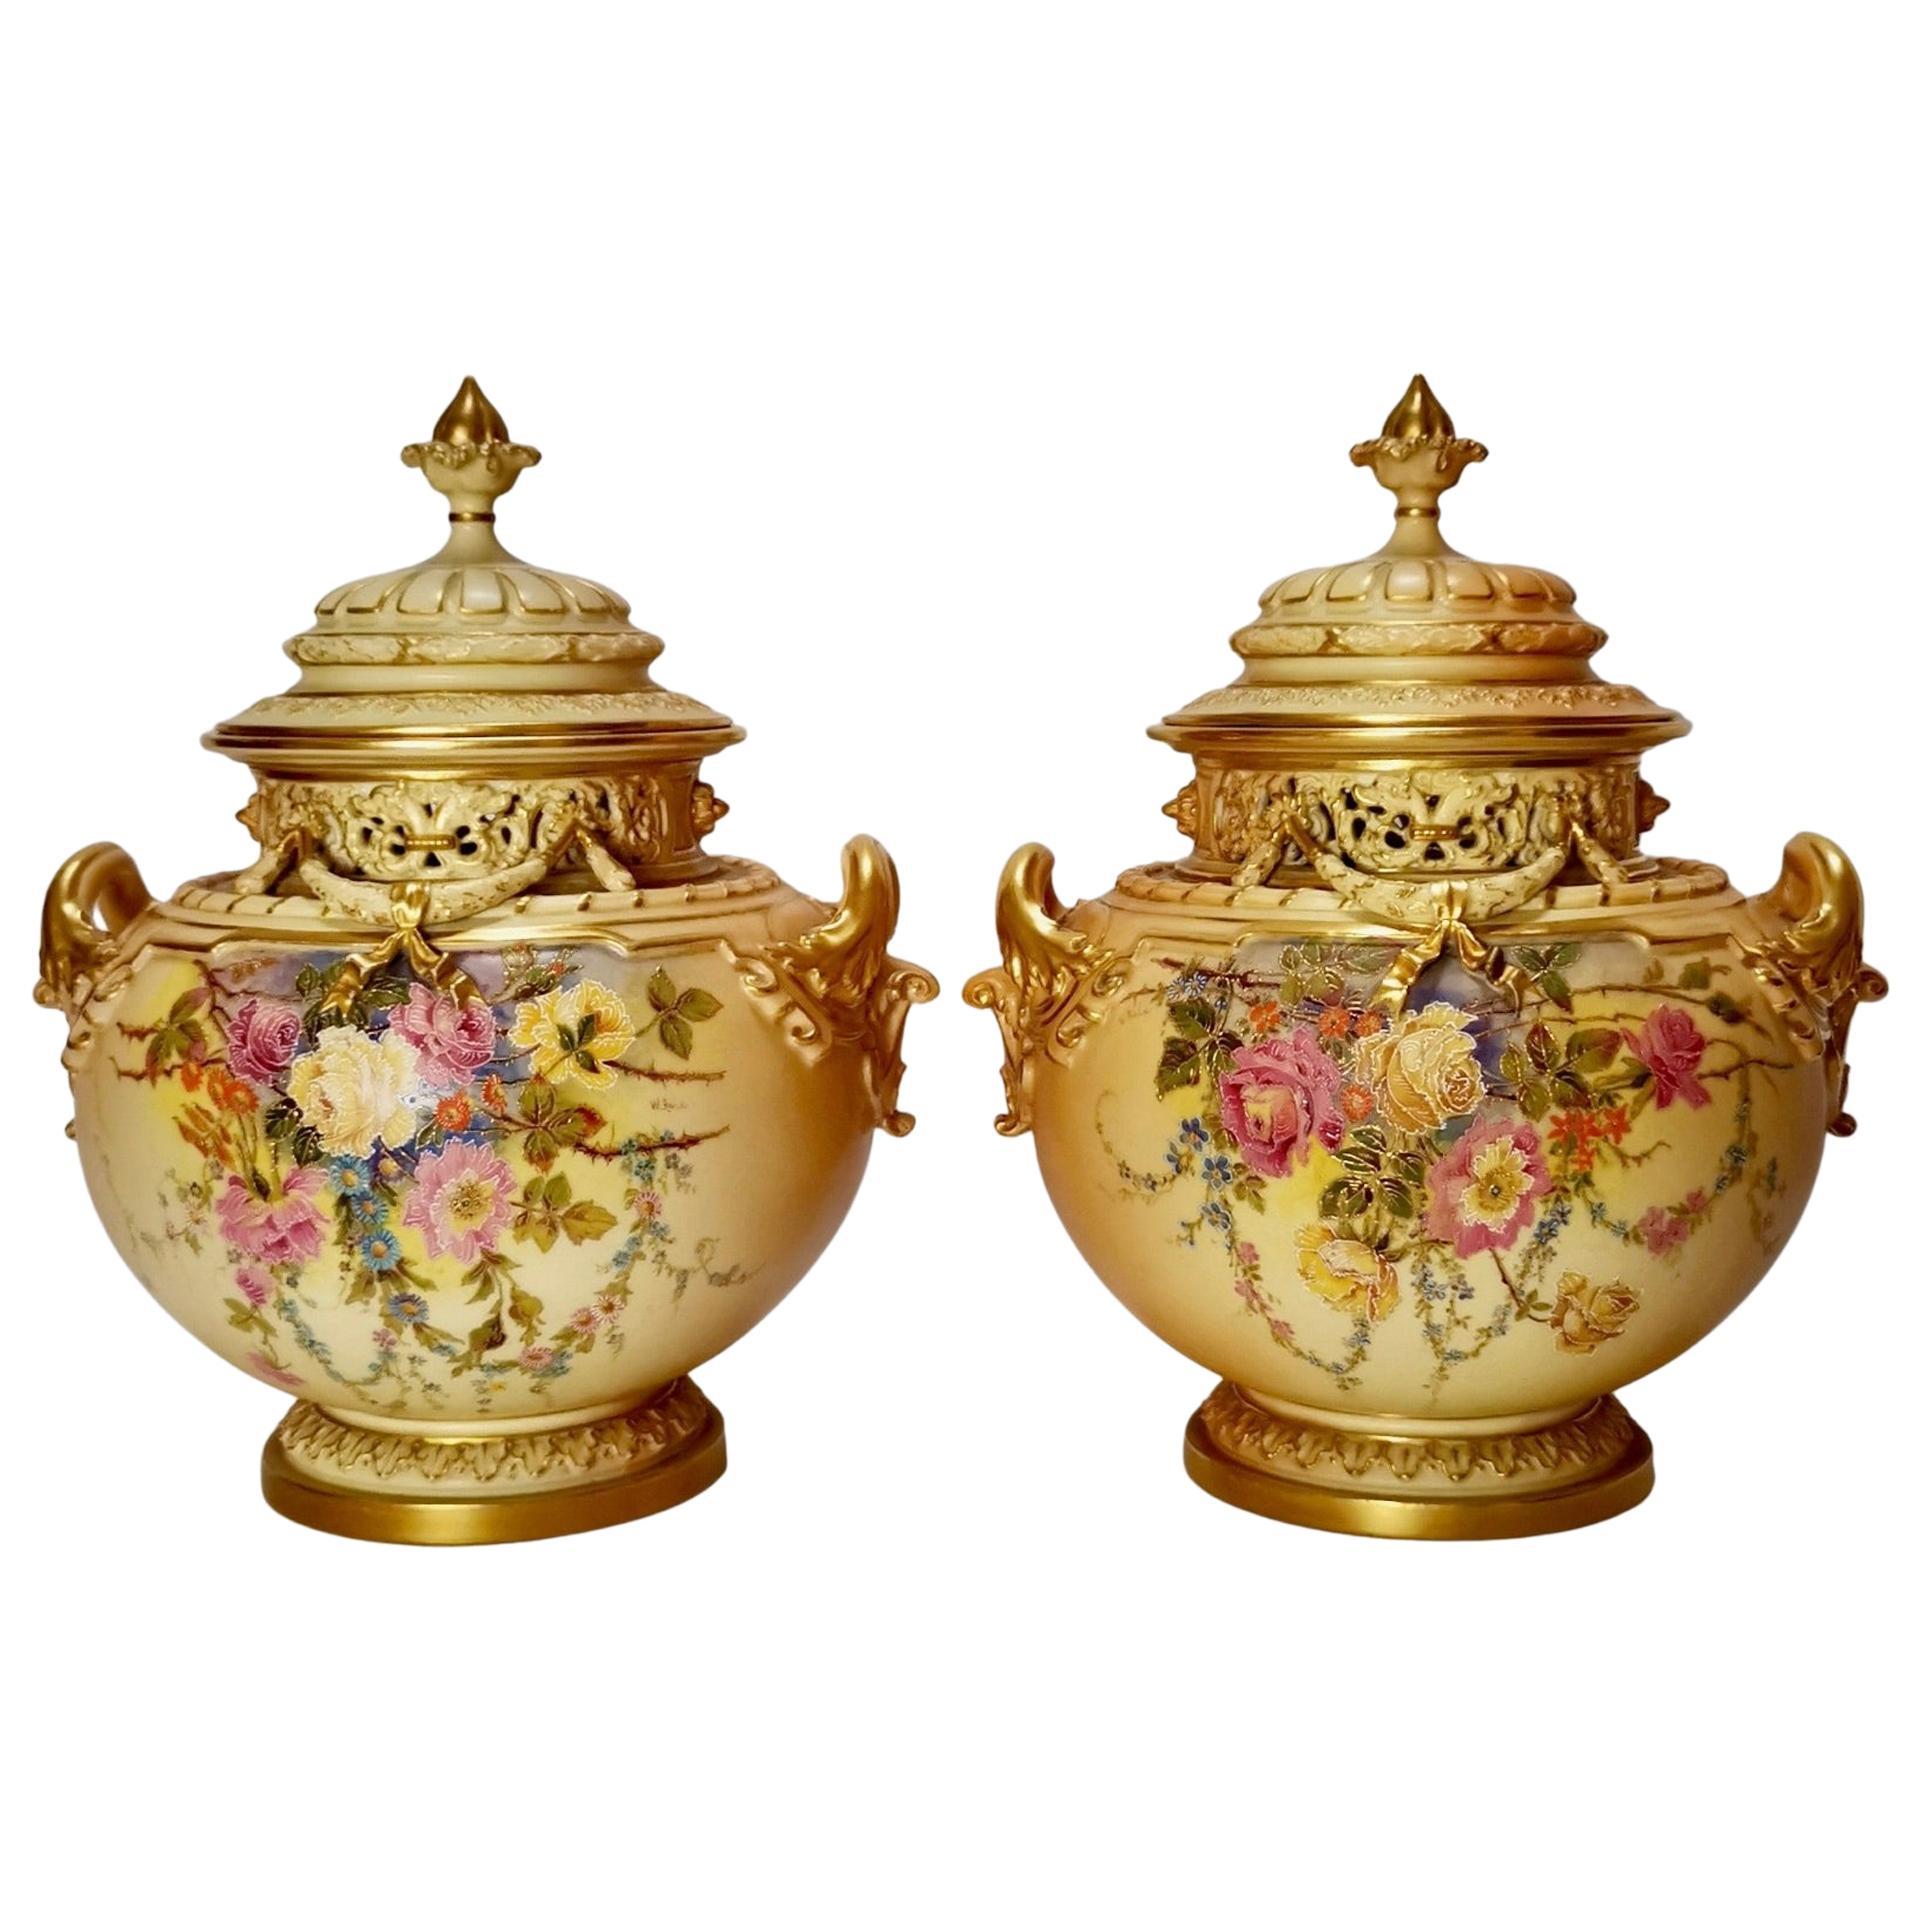 Royal Worcester Pair Porcelain Potpourri Vases, Blush Ivory Signed W. Hale, 1909